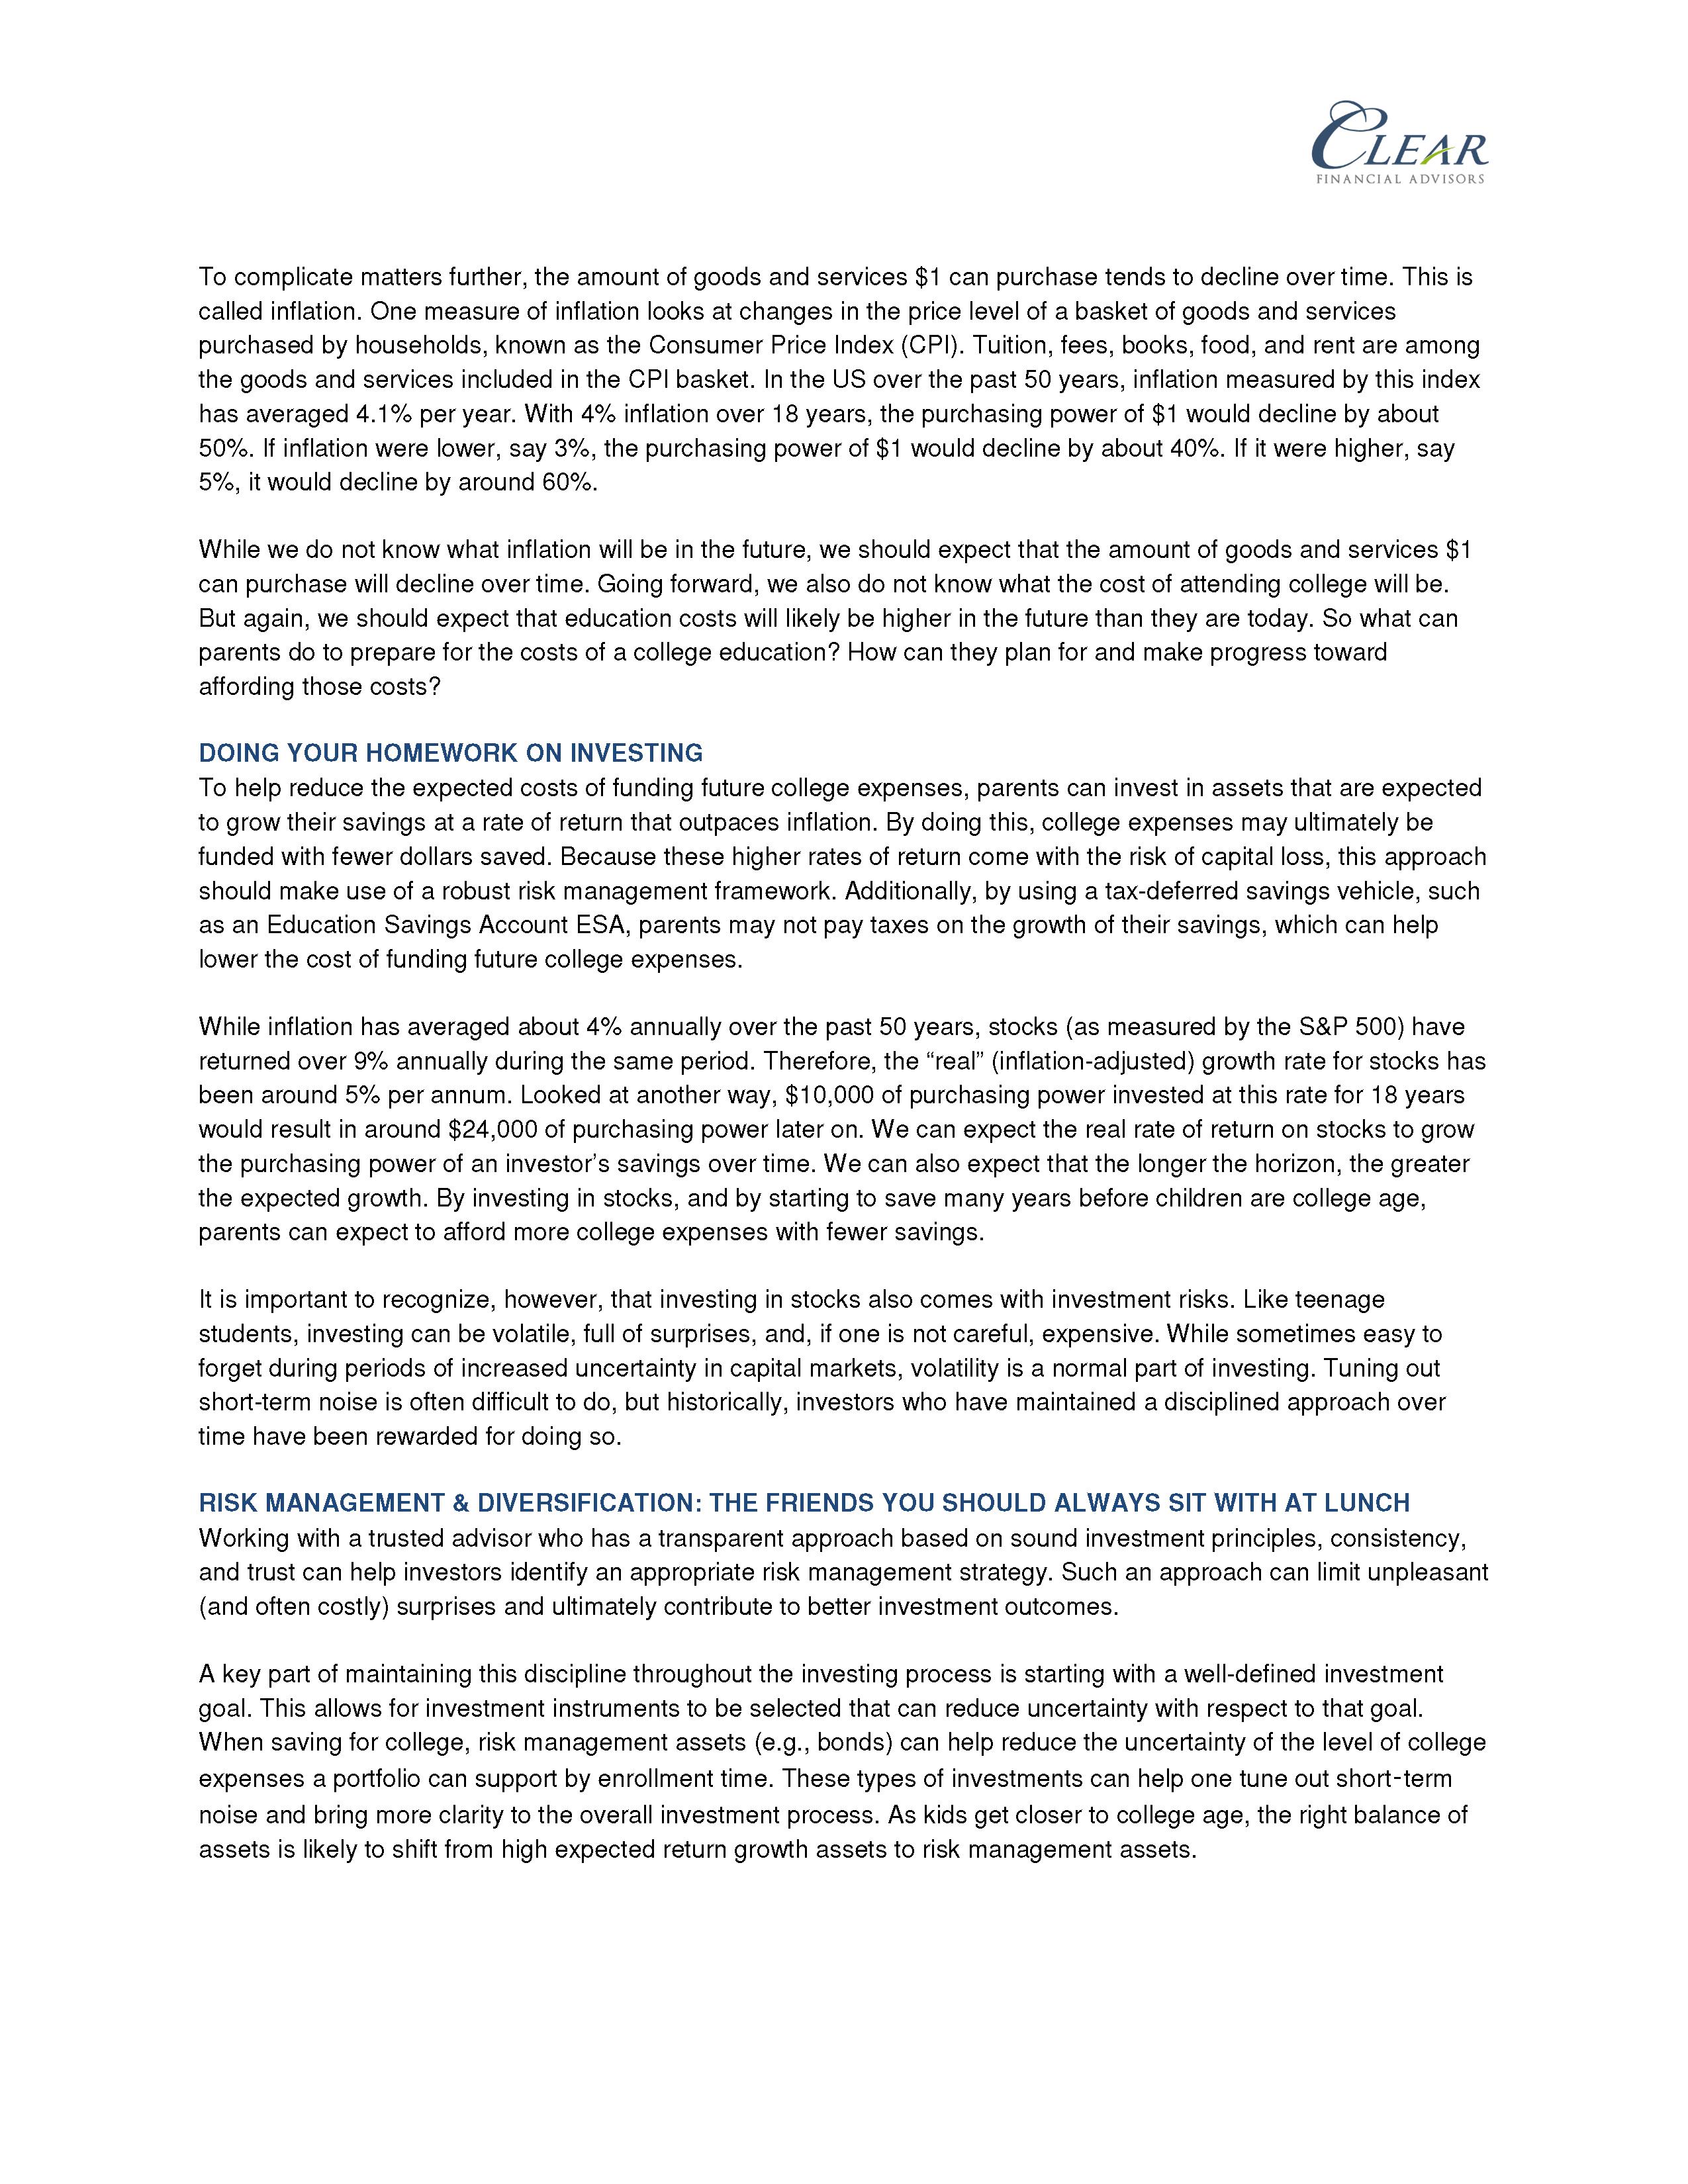 Education Savings Account ESA 2